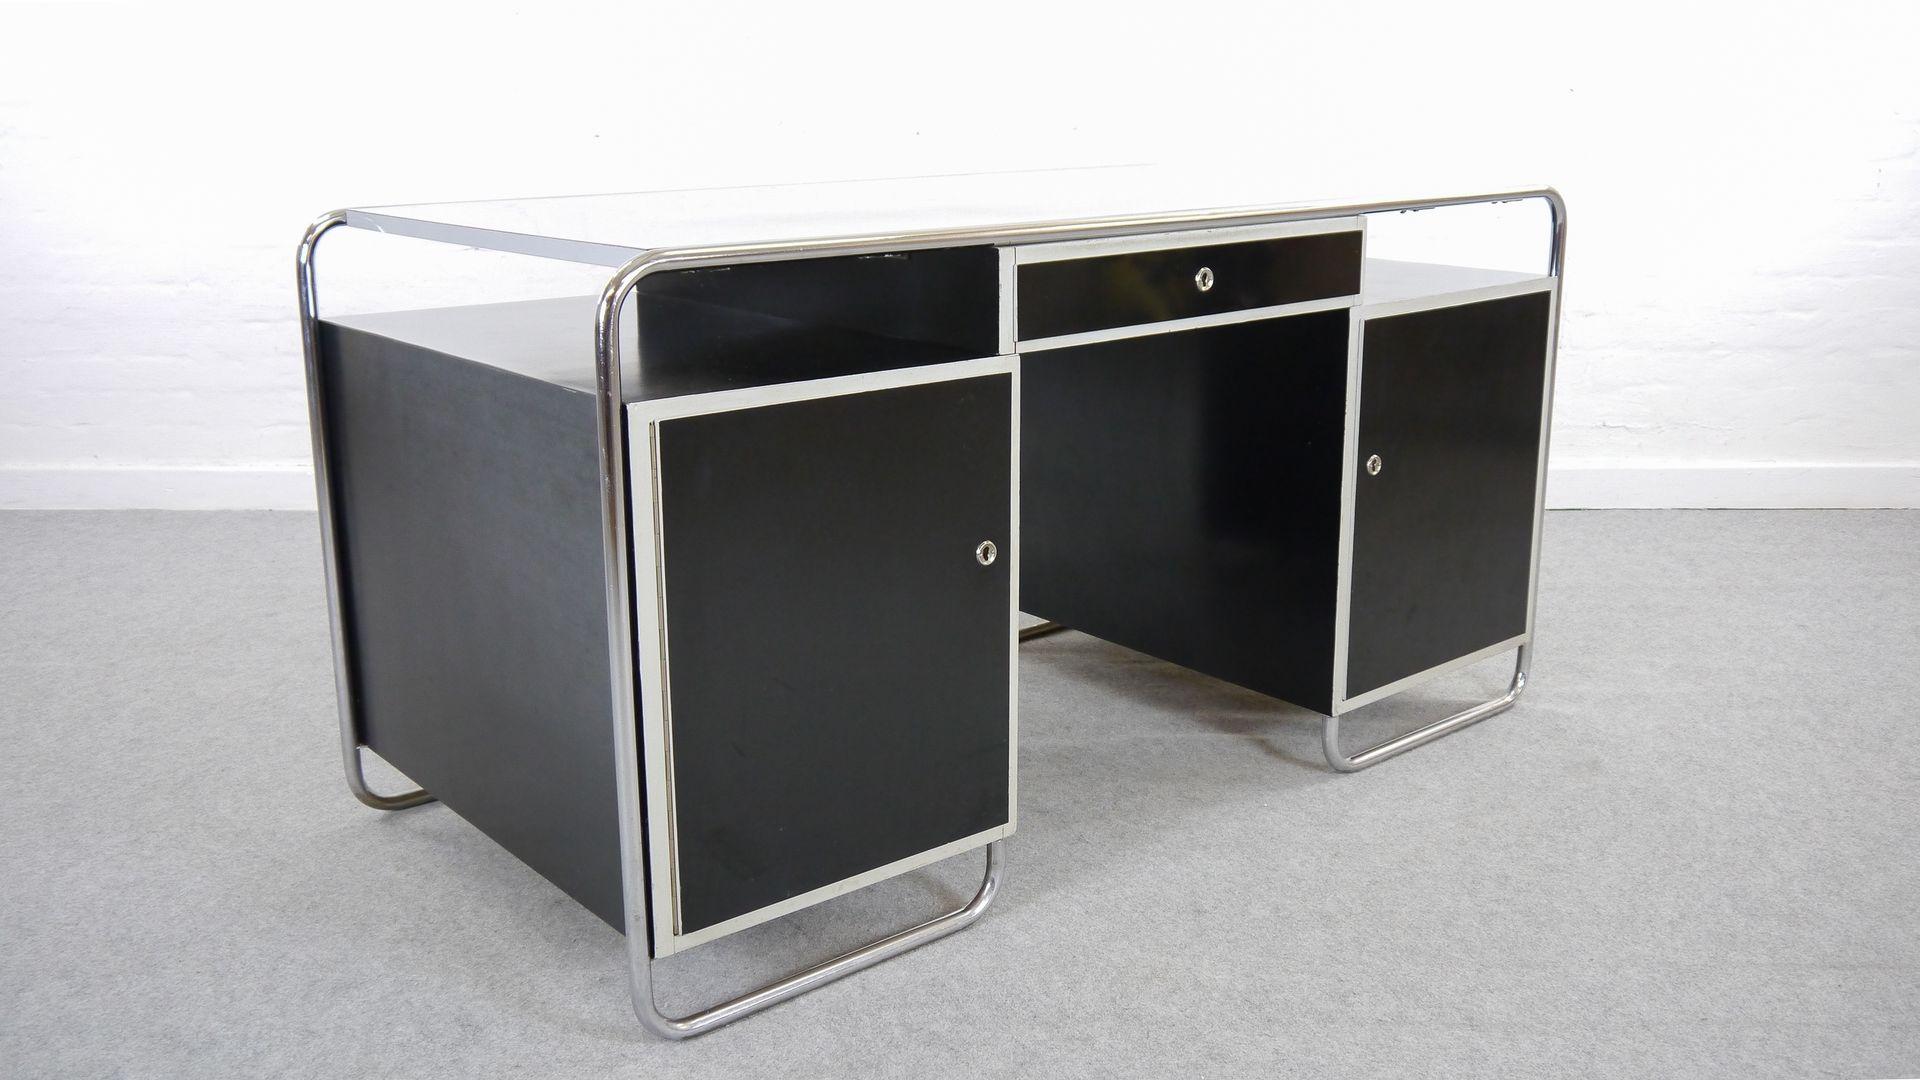 vintage steel furniture. Vintage Bauhaus Style Tubular Steel Desk Furniture E